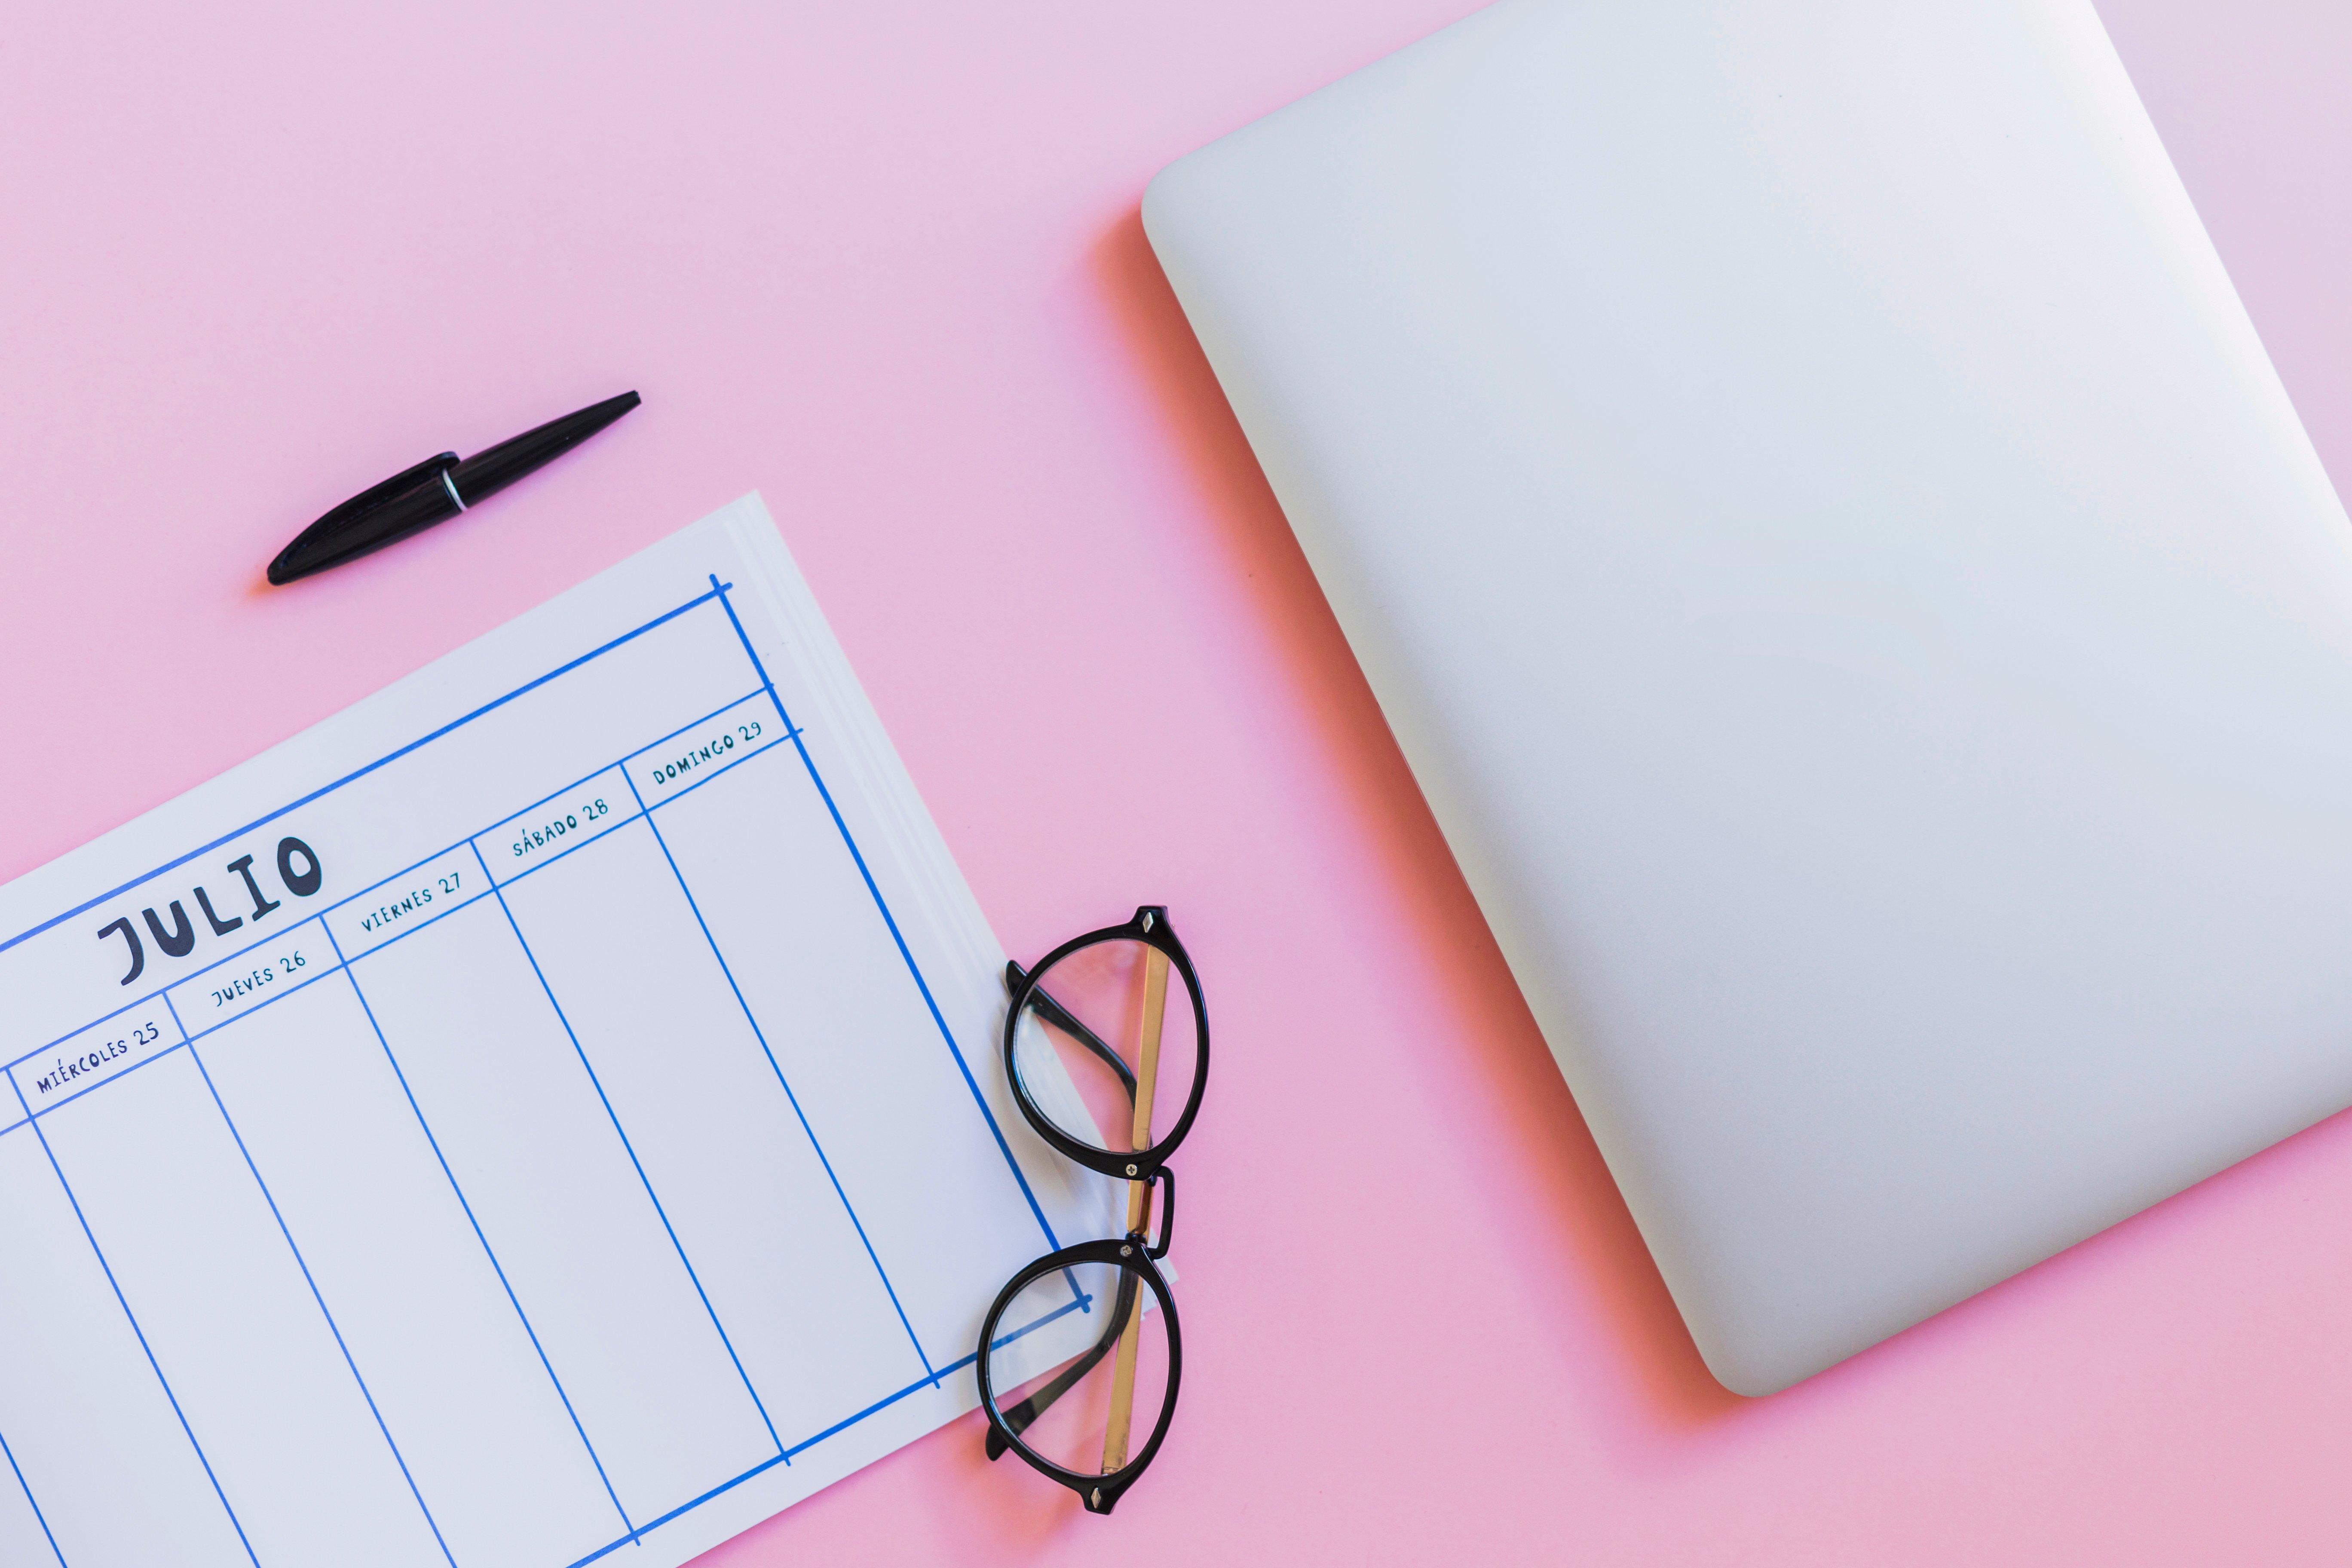 Calendario semanal para planeación con lentes y tableta a un lado